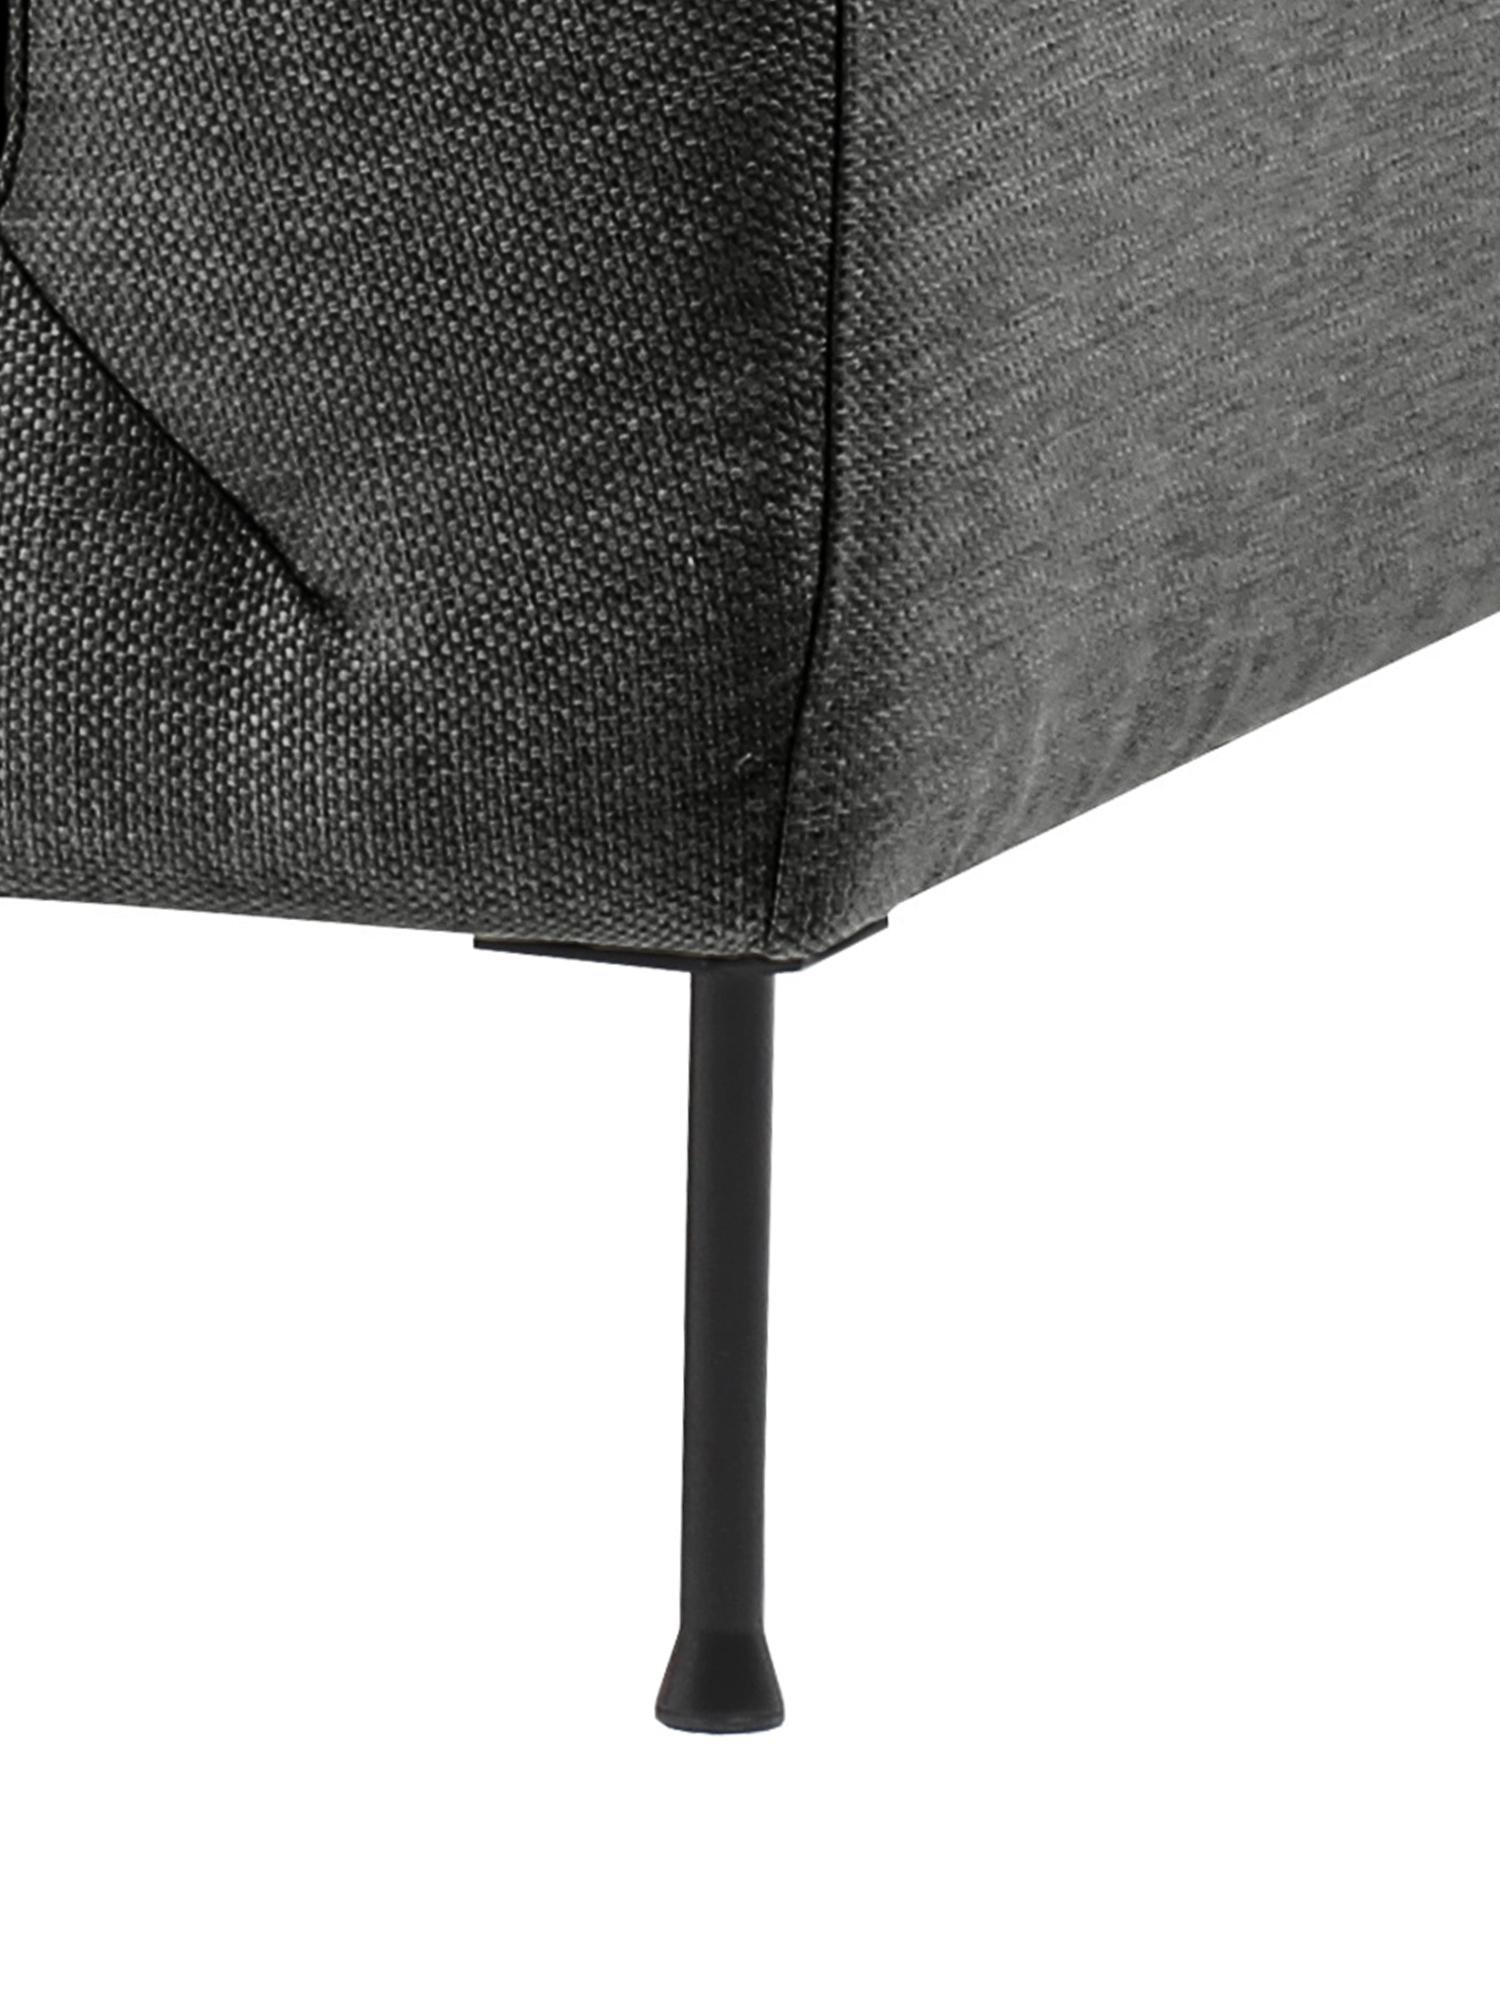 Sofa Cucita (2-Sitzer), Bezug: Webstoff (Polyester) 45.0, Gestell: Massives Kiefernholz, Füße: Metall, lackiert, Webstoff Anthrazit, B 187 x T 94 cm